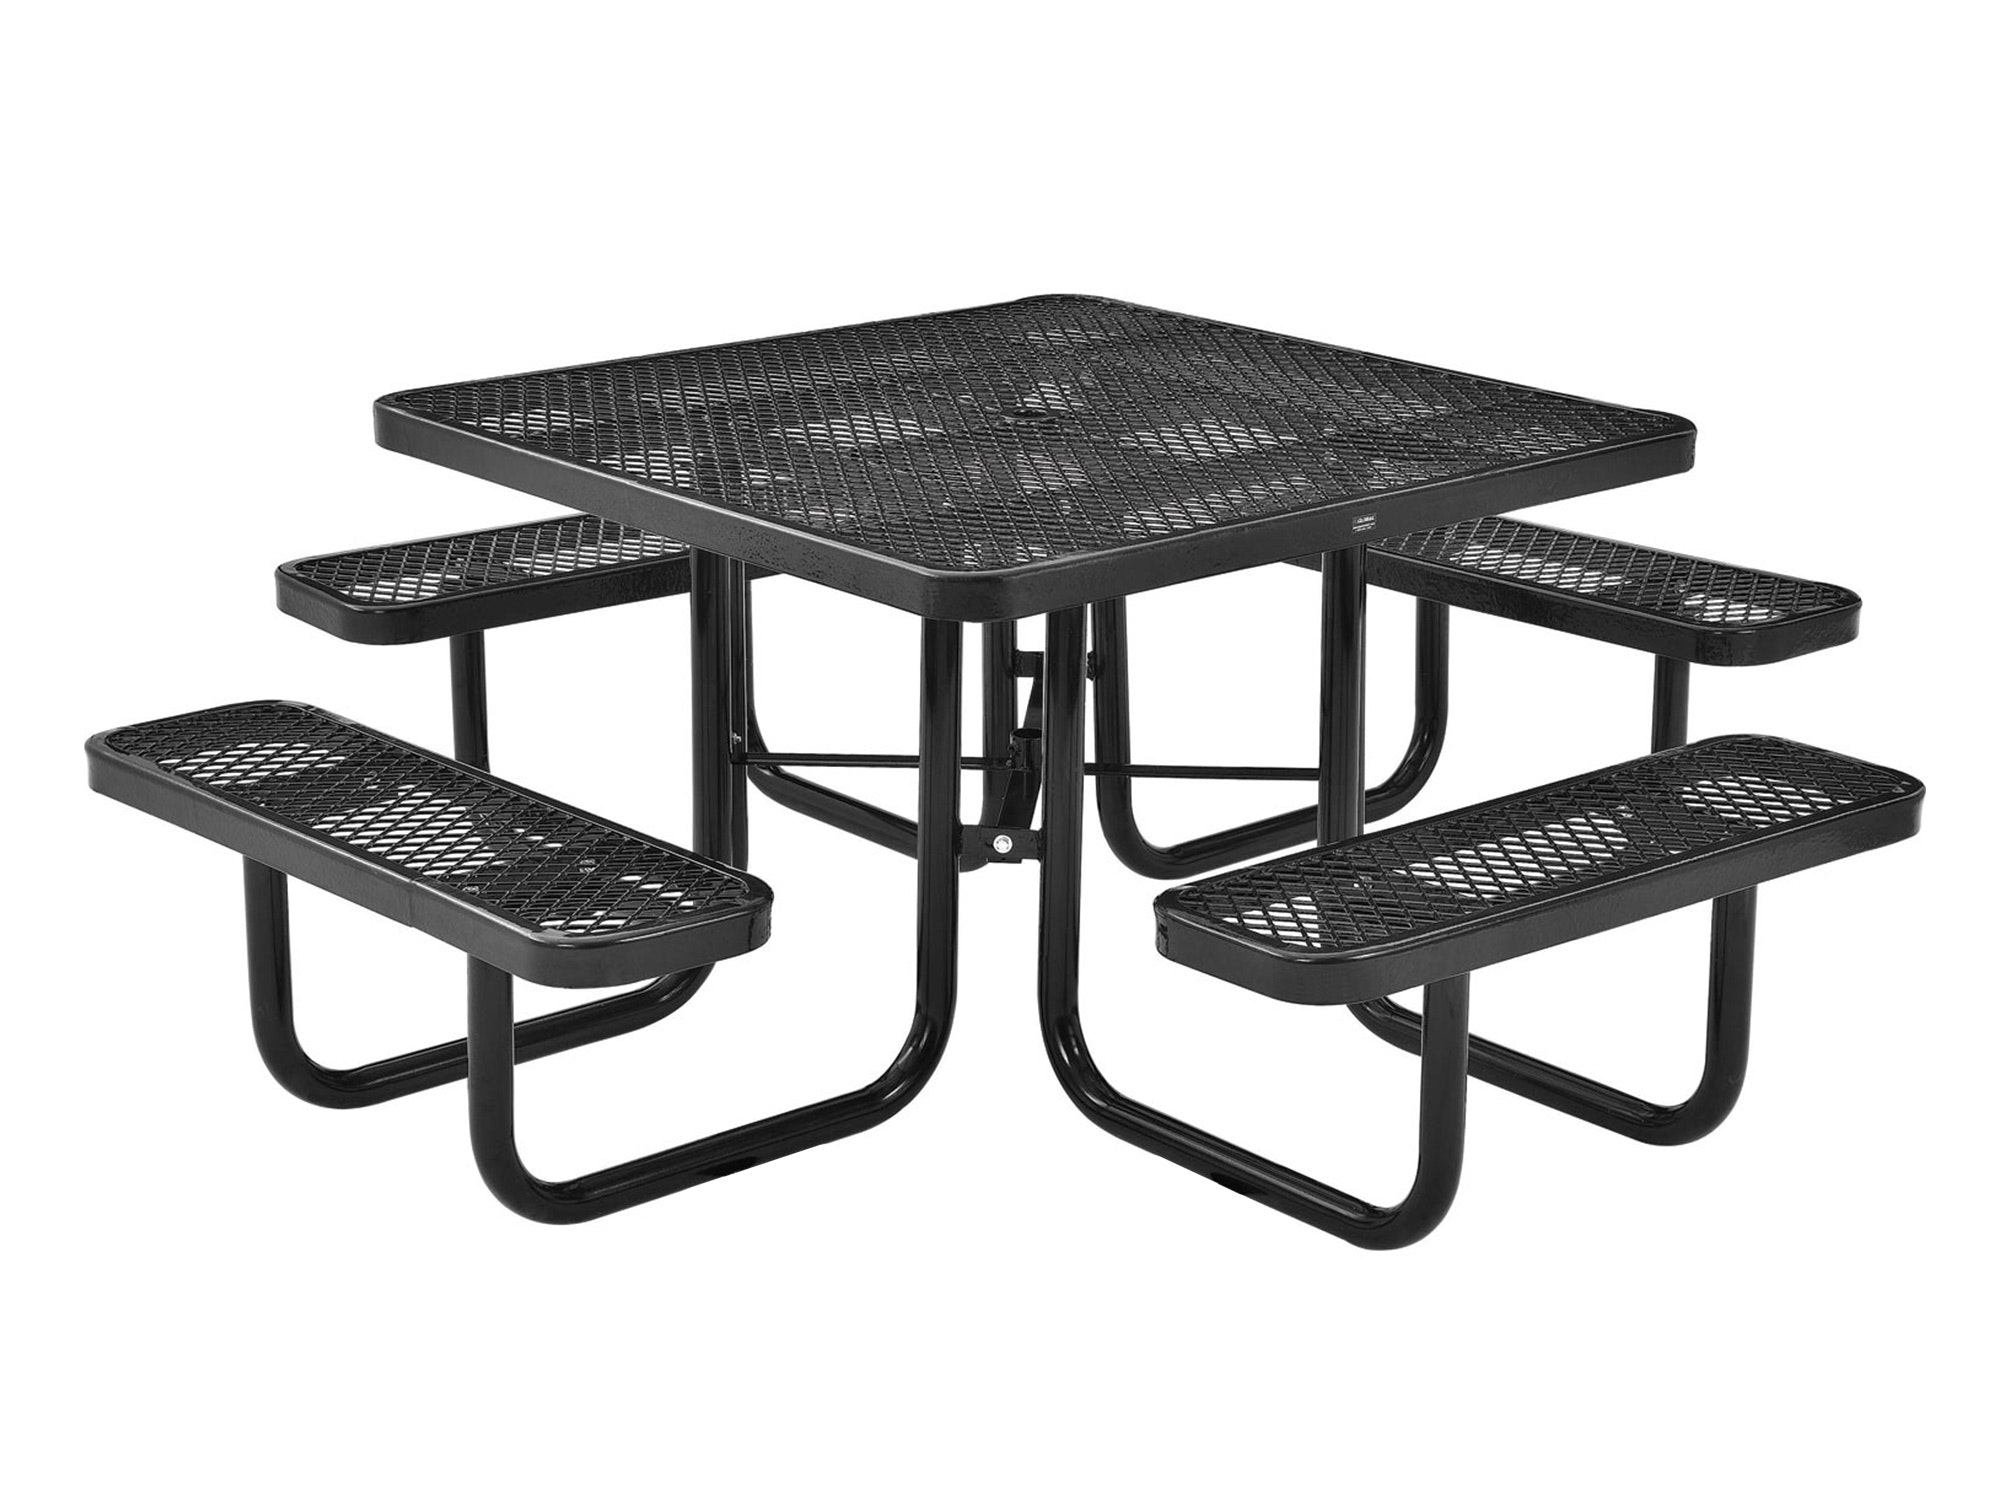 Picnic Table Square 8 Seater - Black